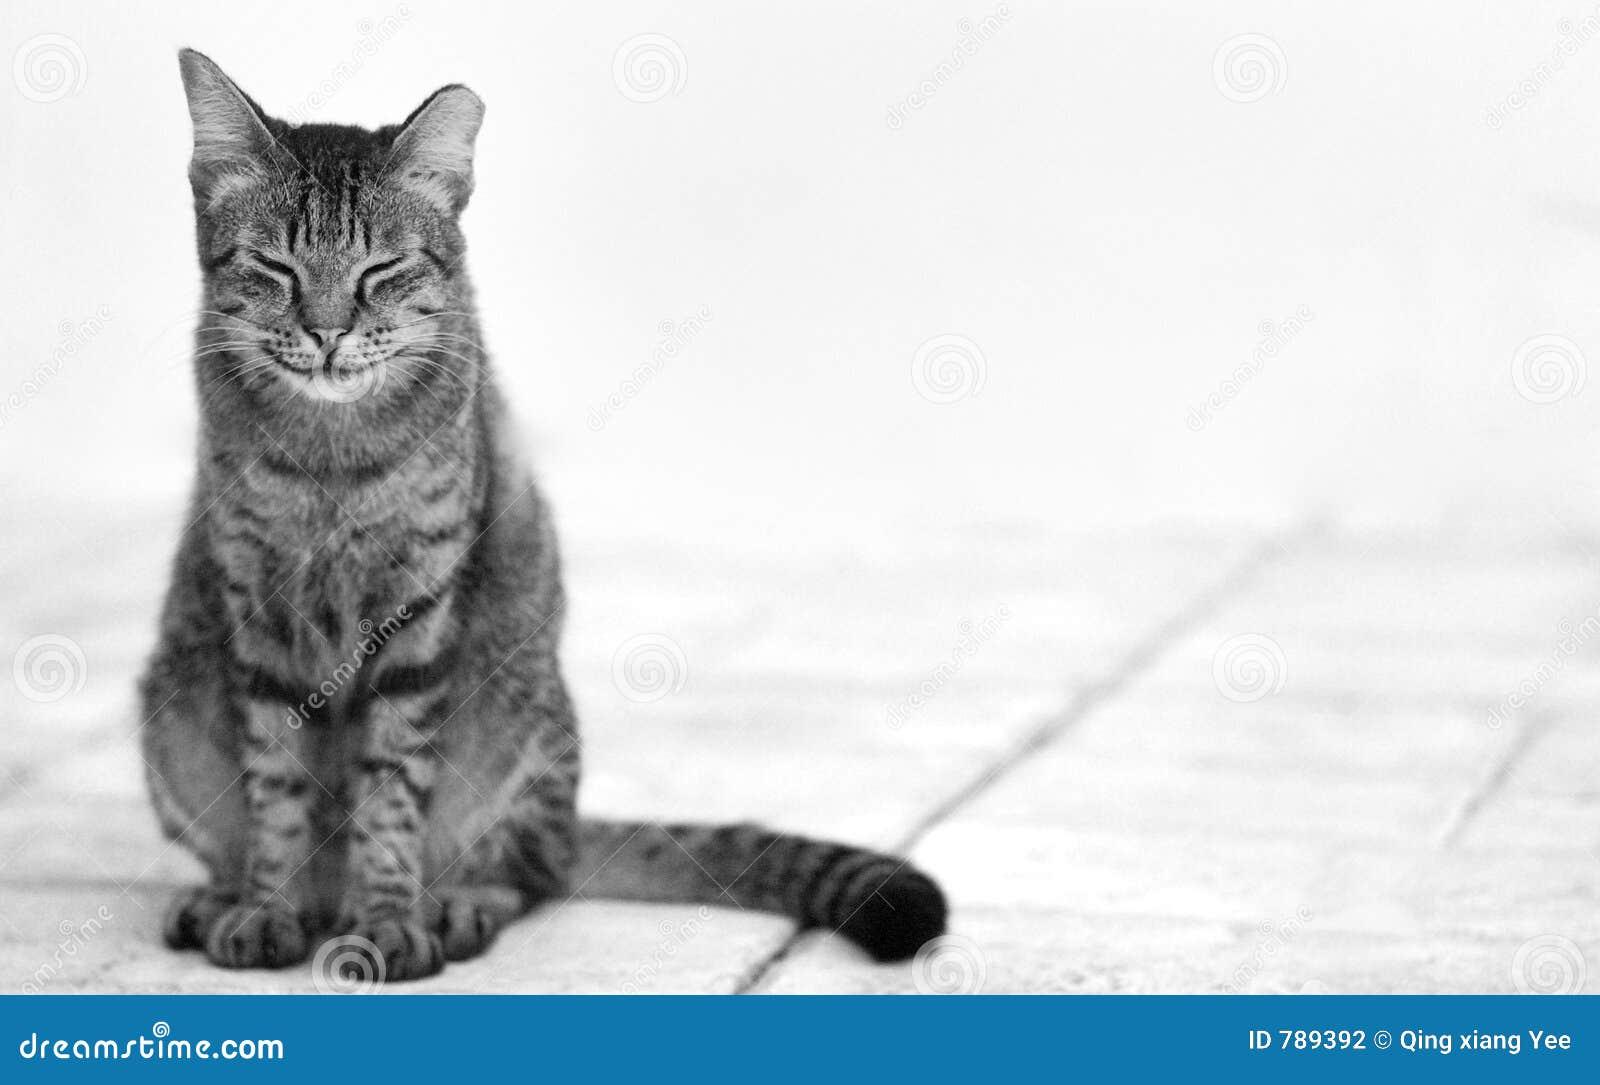 16d05970b90d γκρίζα ευτυχής ελαφριά μονοχρωματική συνεδρίαση πατωμάτων γατών ανασκόπησης  μαύρη που χαμογελά άσπρο υπόλευκο